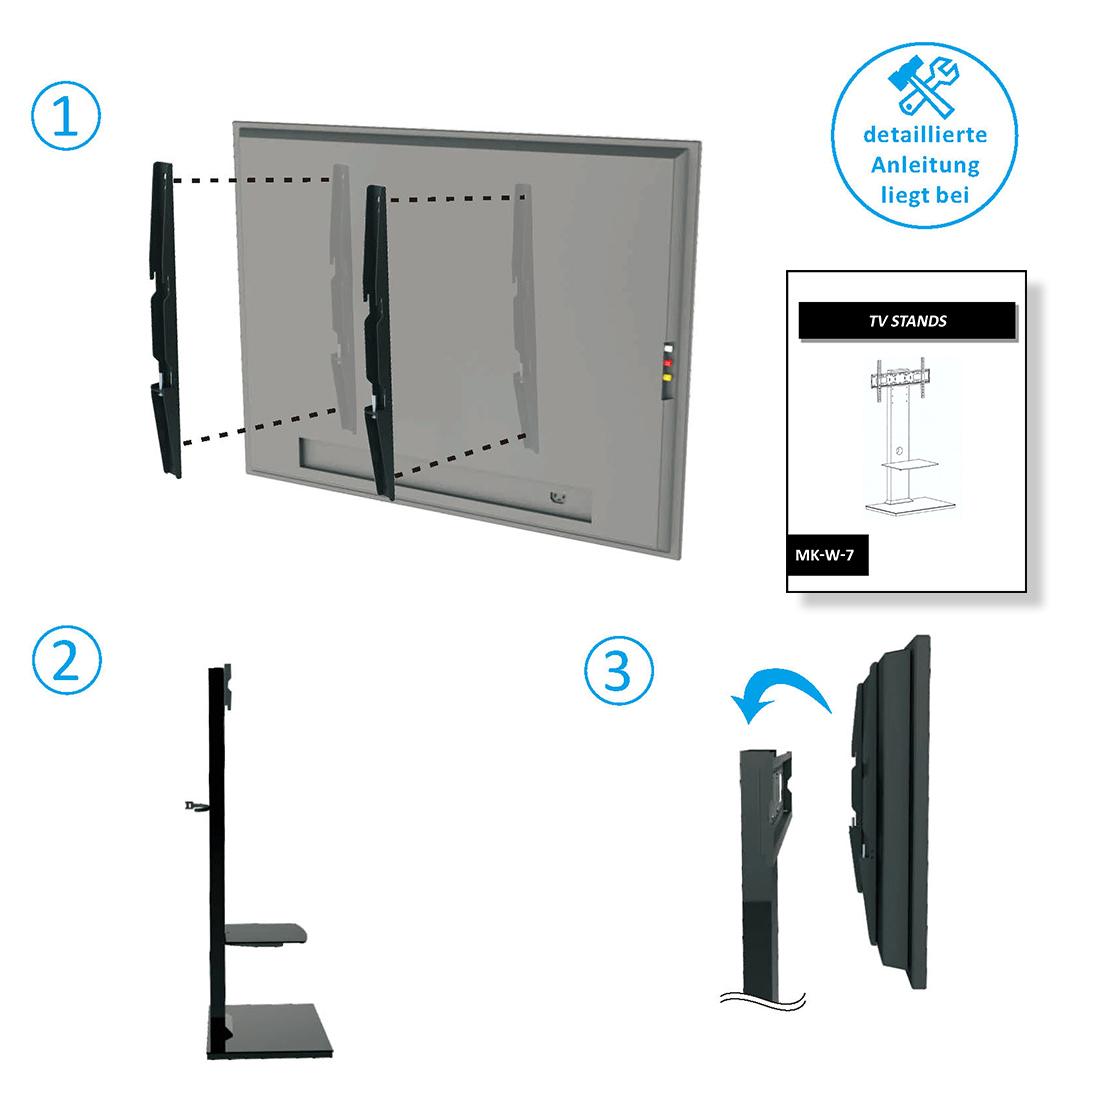 deleycon tv st nder standfu mit glasablage 26 65 zoll bis 40kg schwarz deleycon. Black Bedroom Furniture Sets. Home Design Ideas